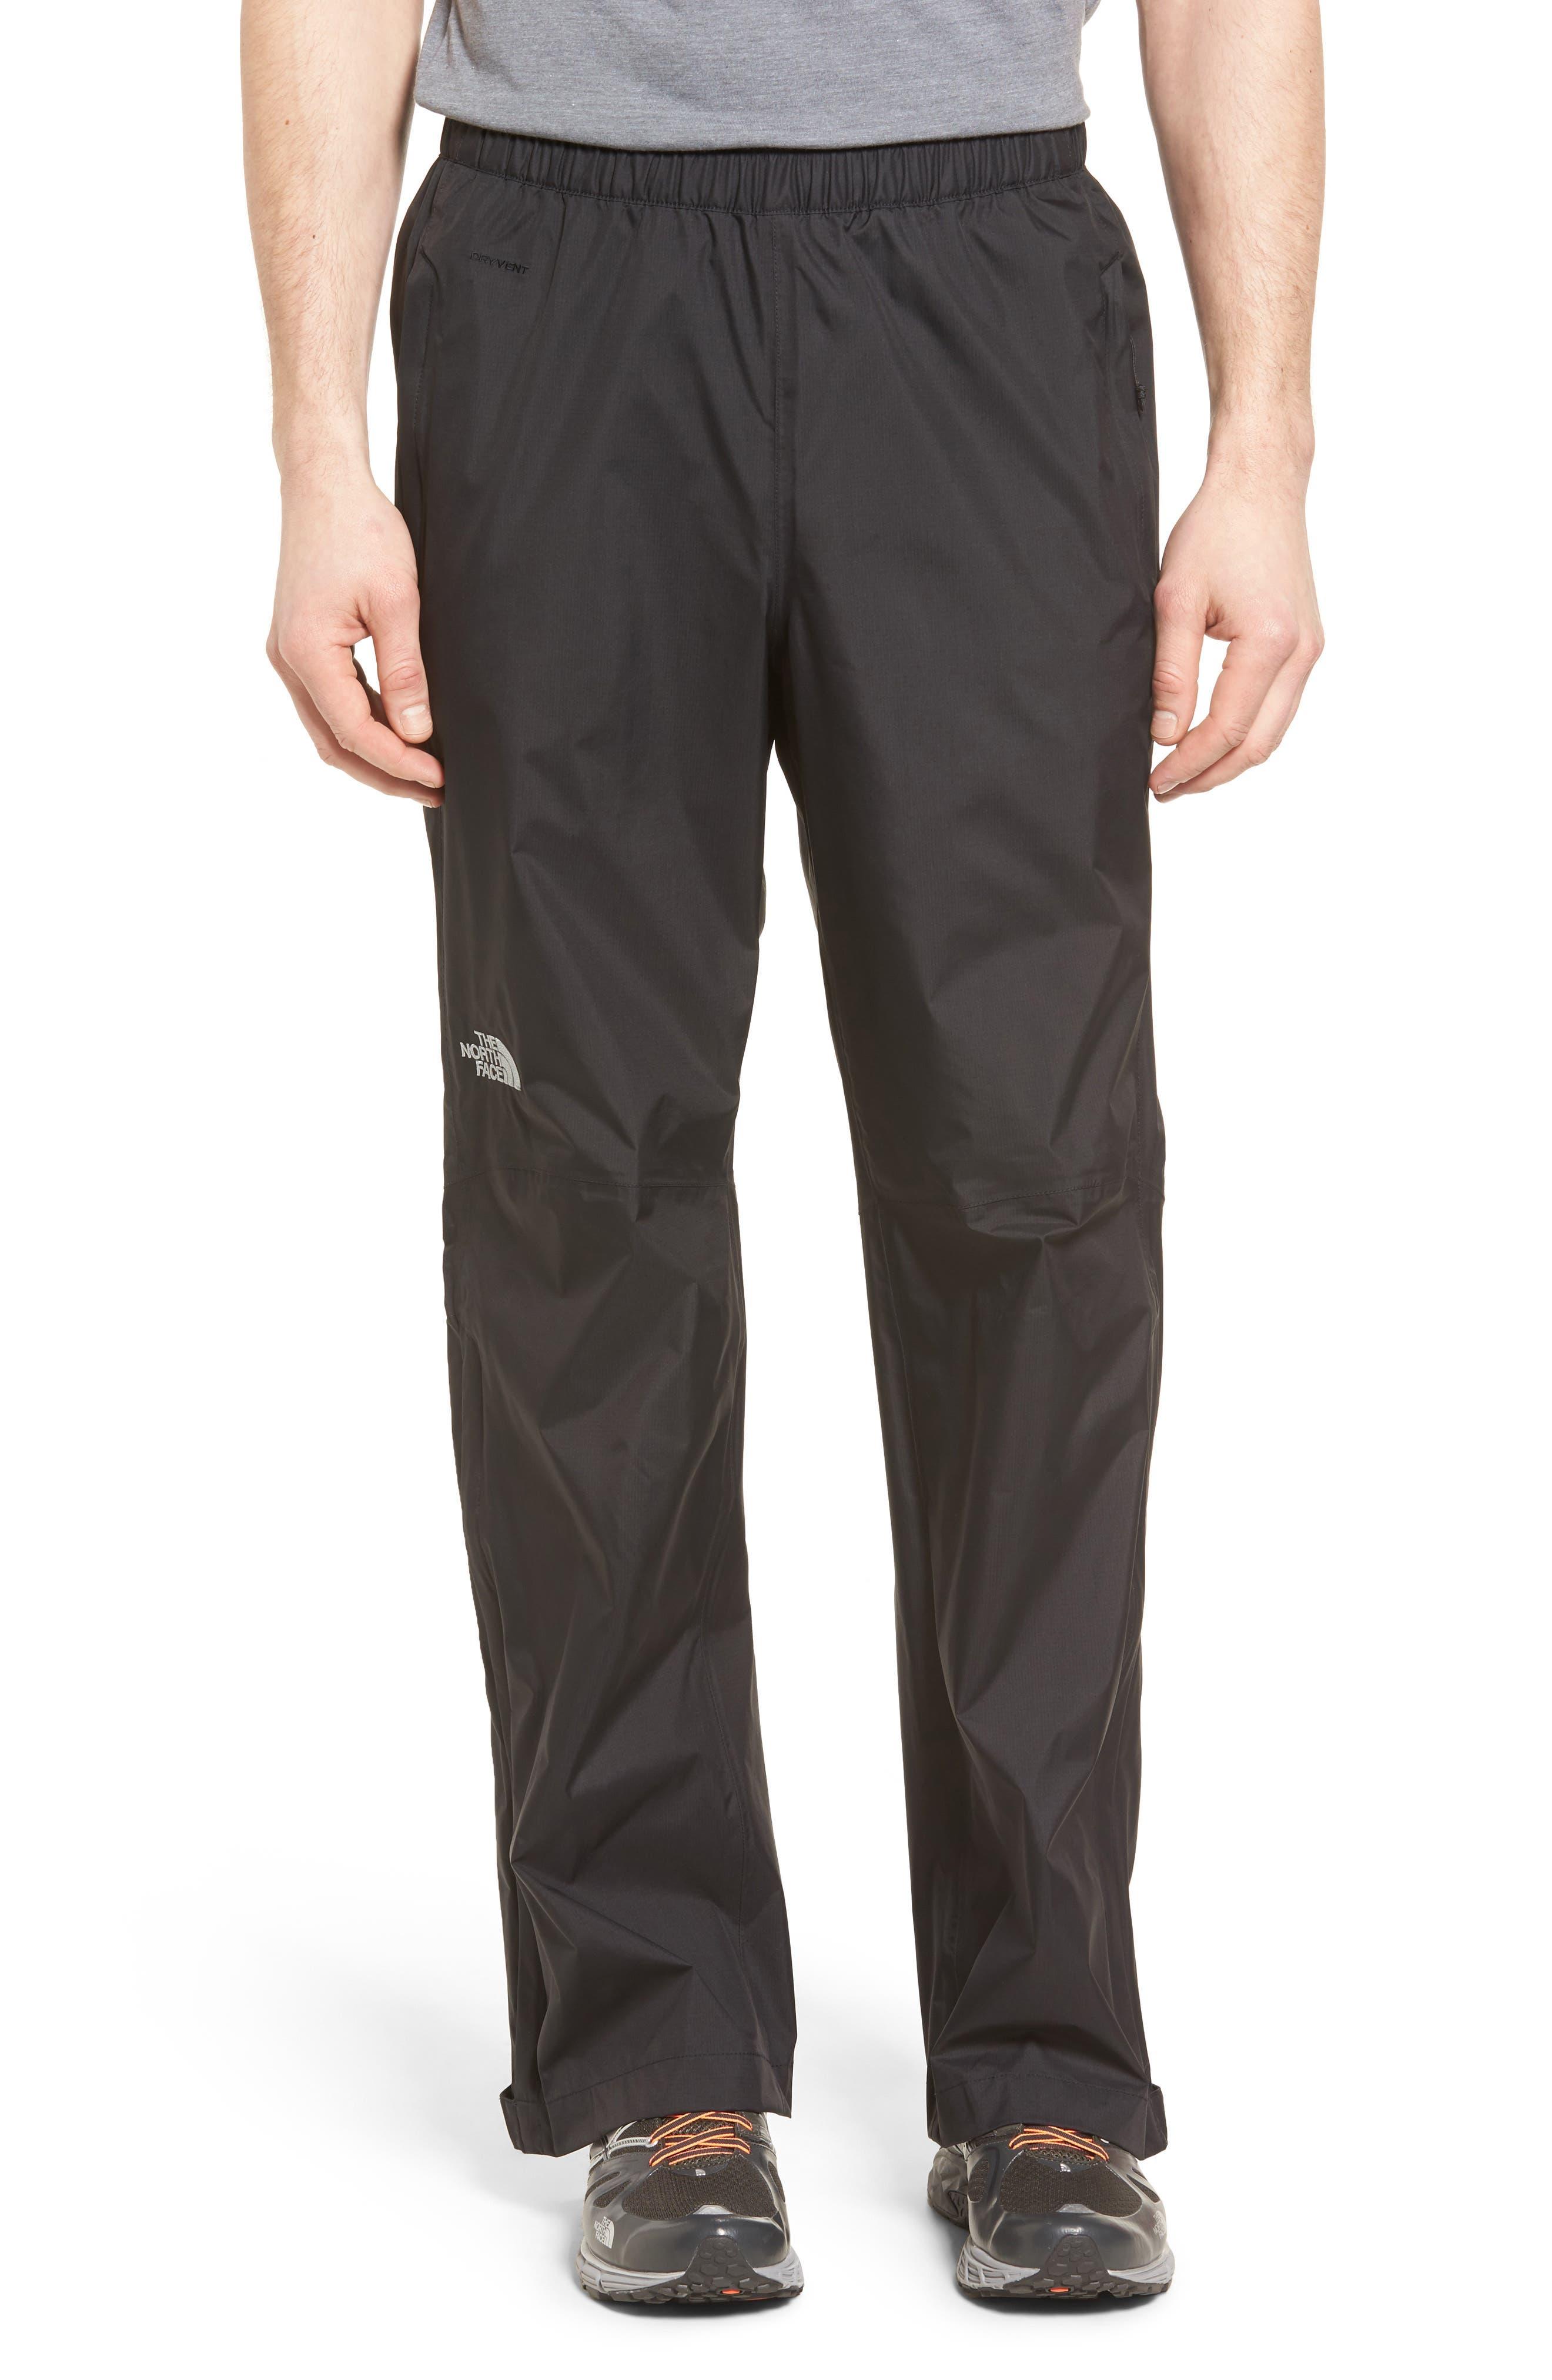 Venture Waterproof Pants,                         Main,                         color, Black